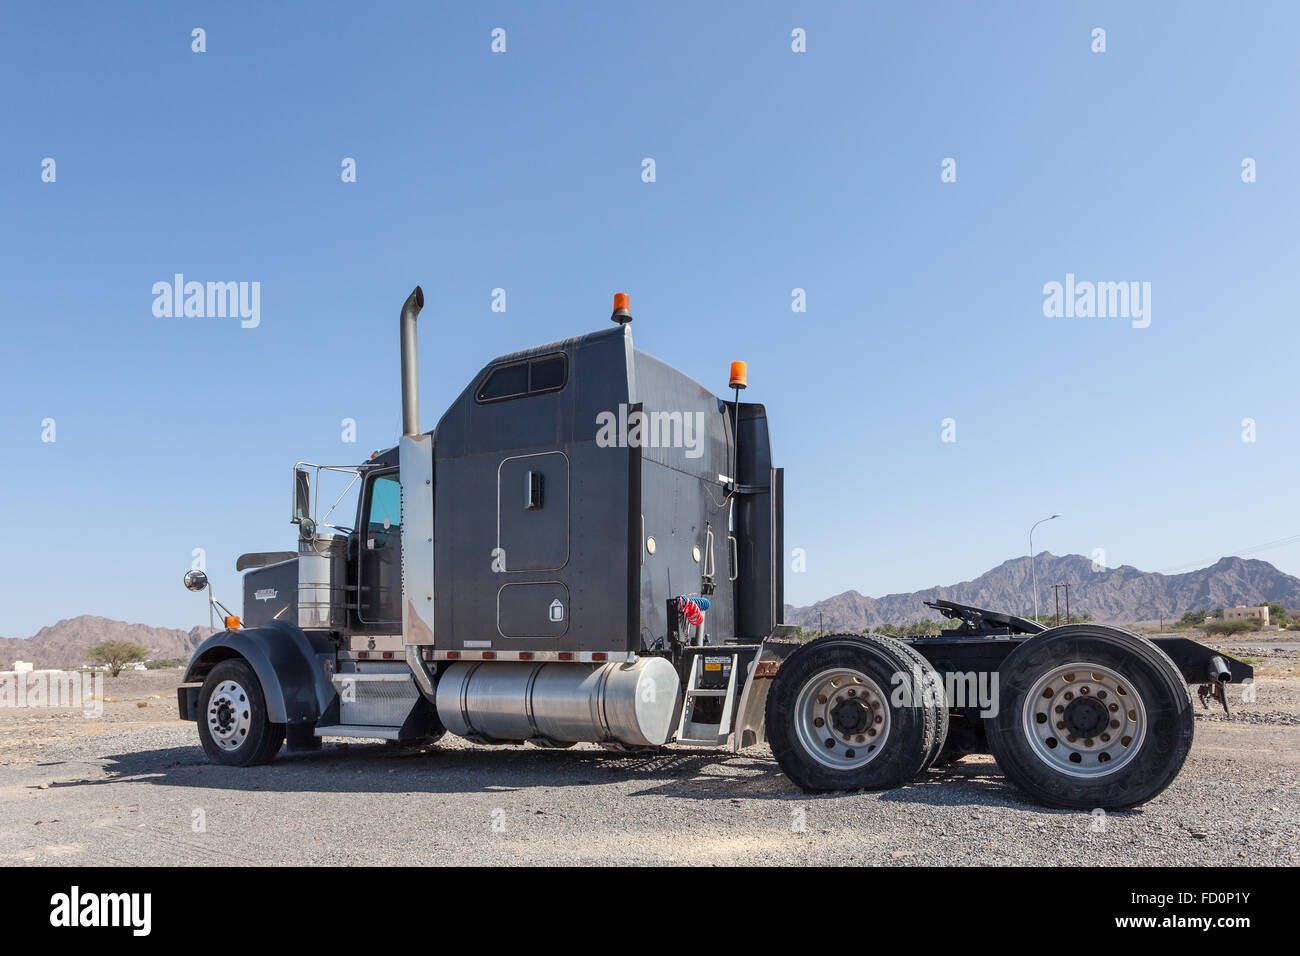 Kenworth semitrailer truck - Stock Image